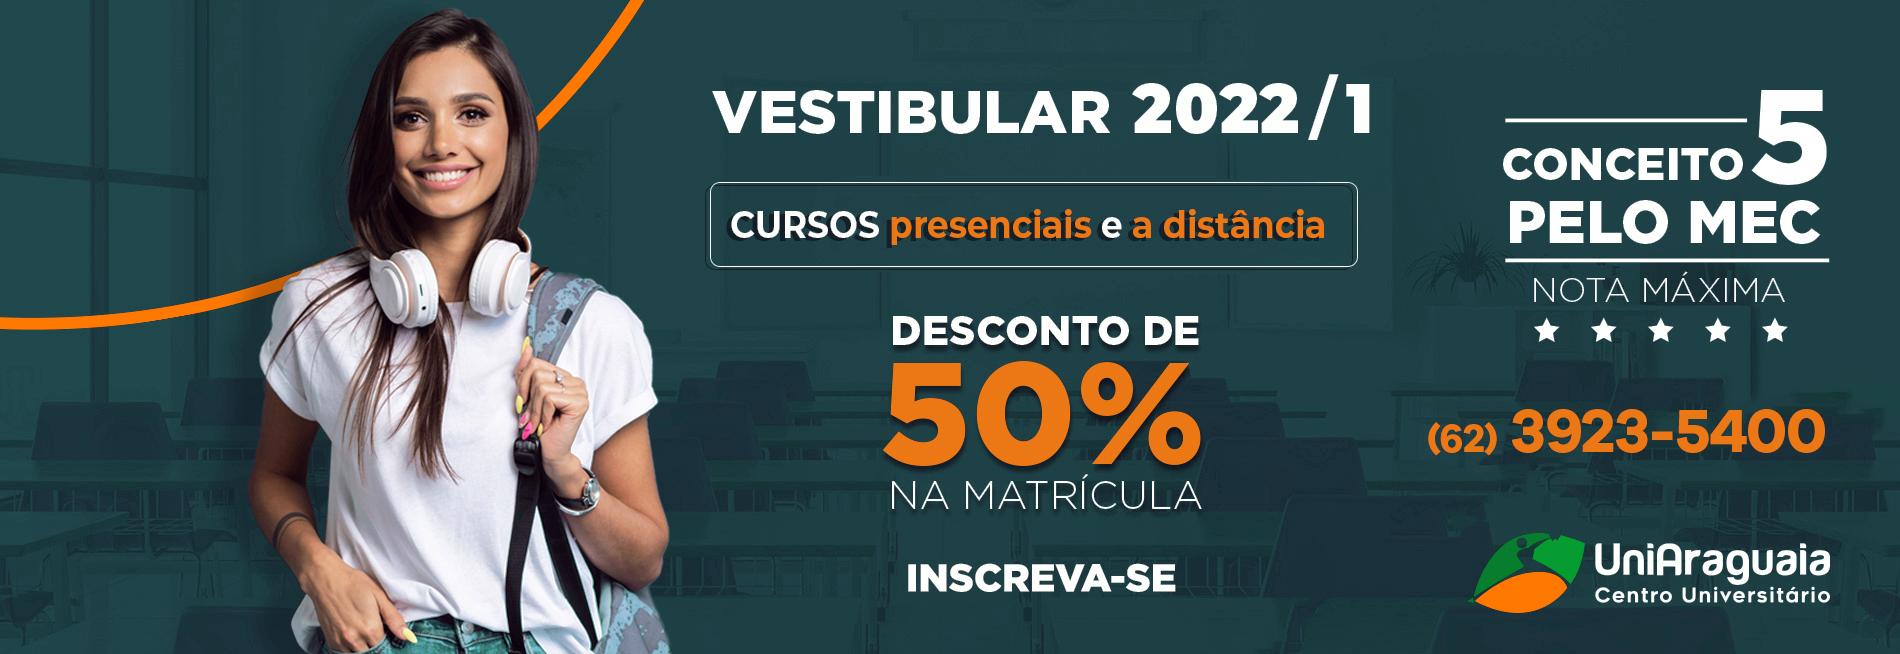 UNIARAGUAIA - Vestibular tá ON